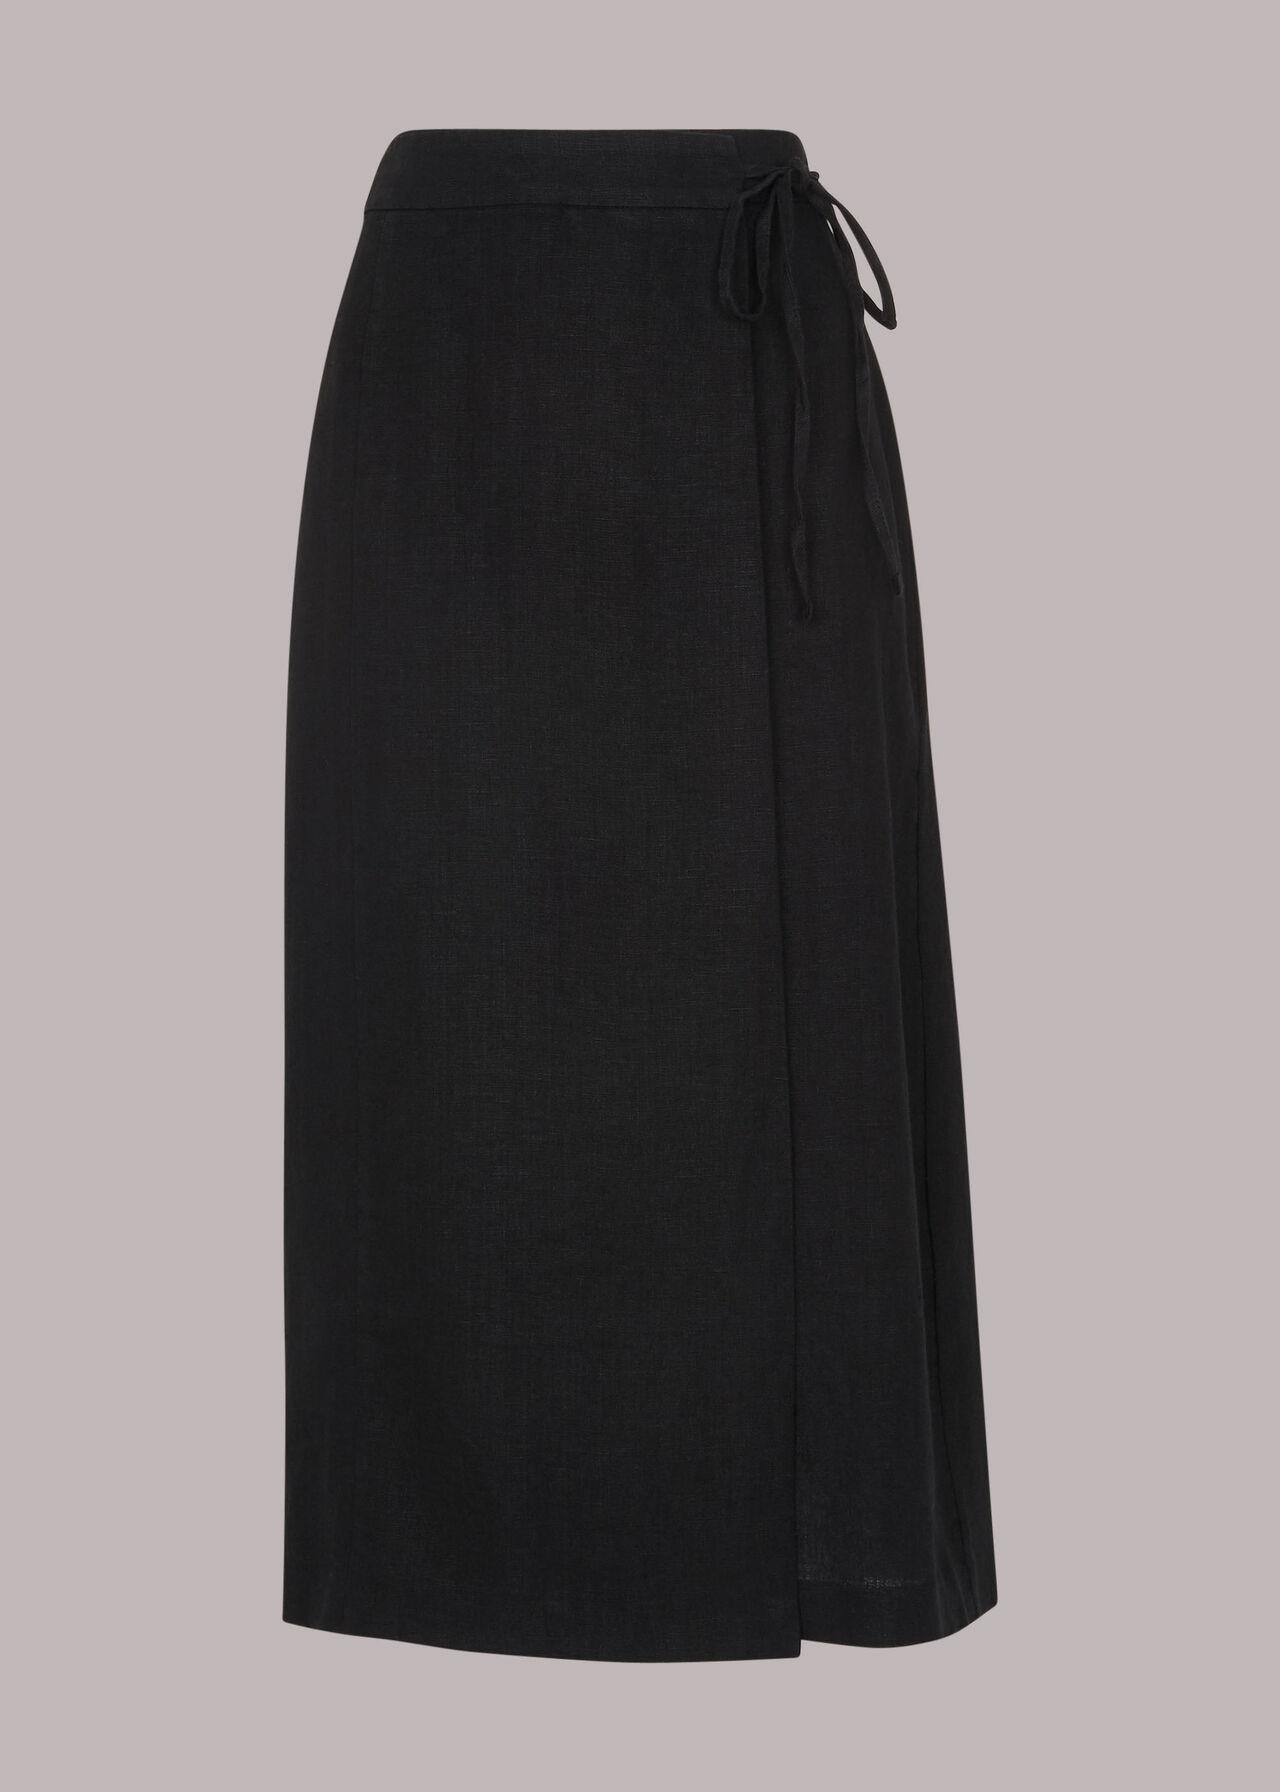 Wrap Detail Linen Skirt